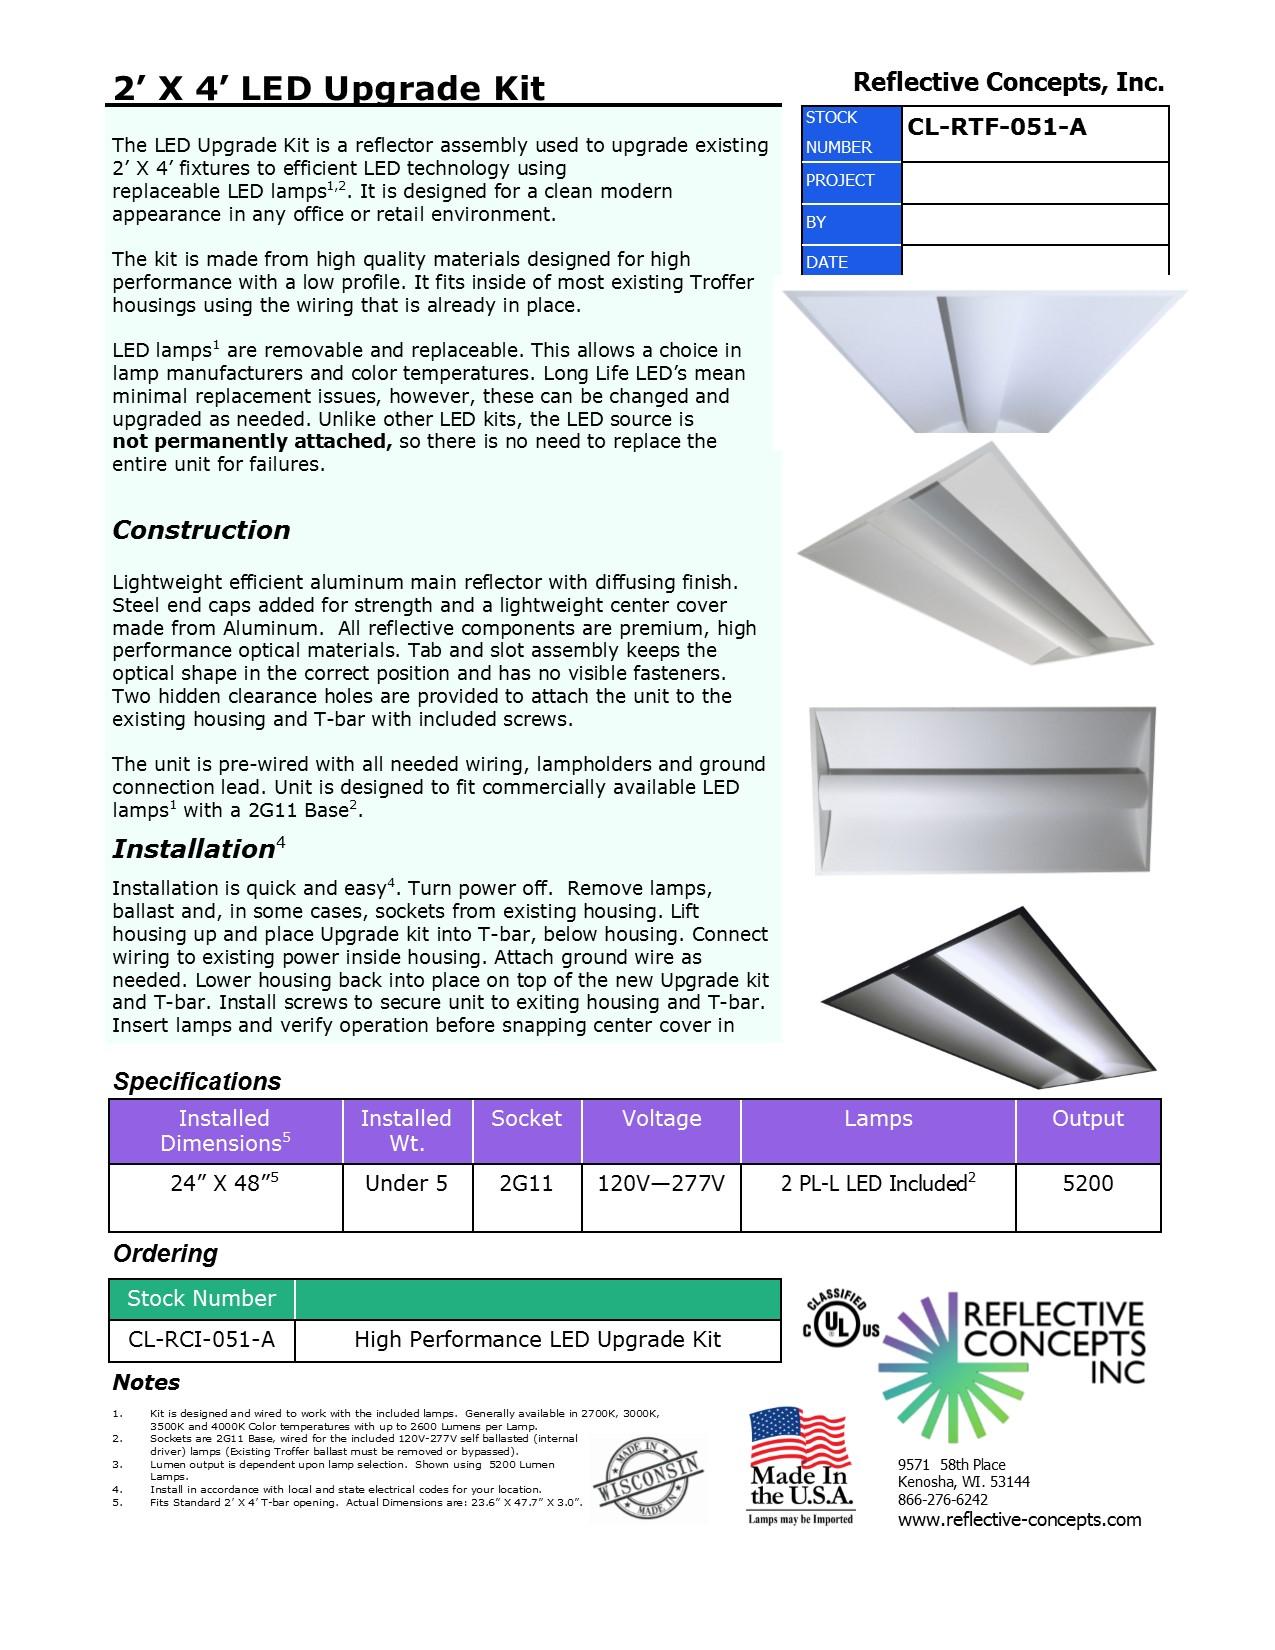 RCI51-Marketing Flyer -2018 version.jpg